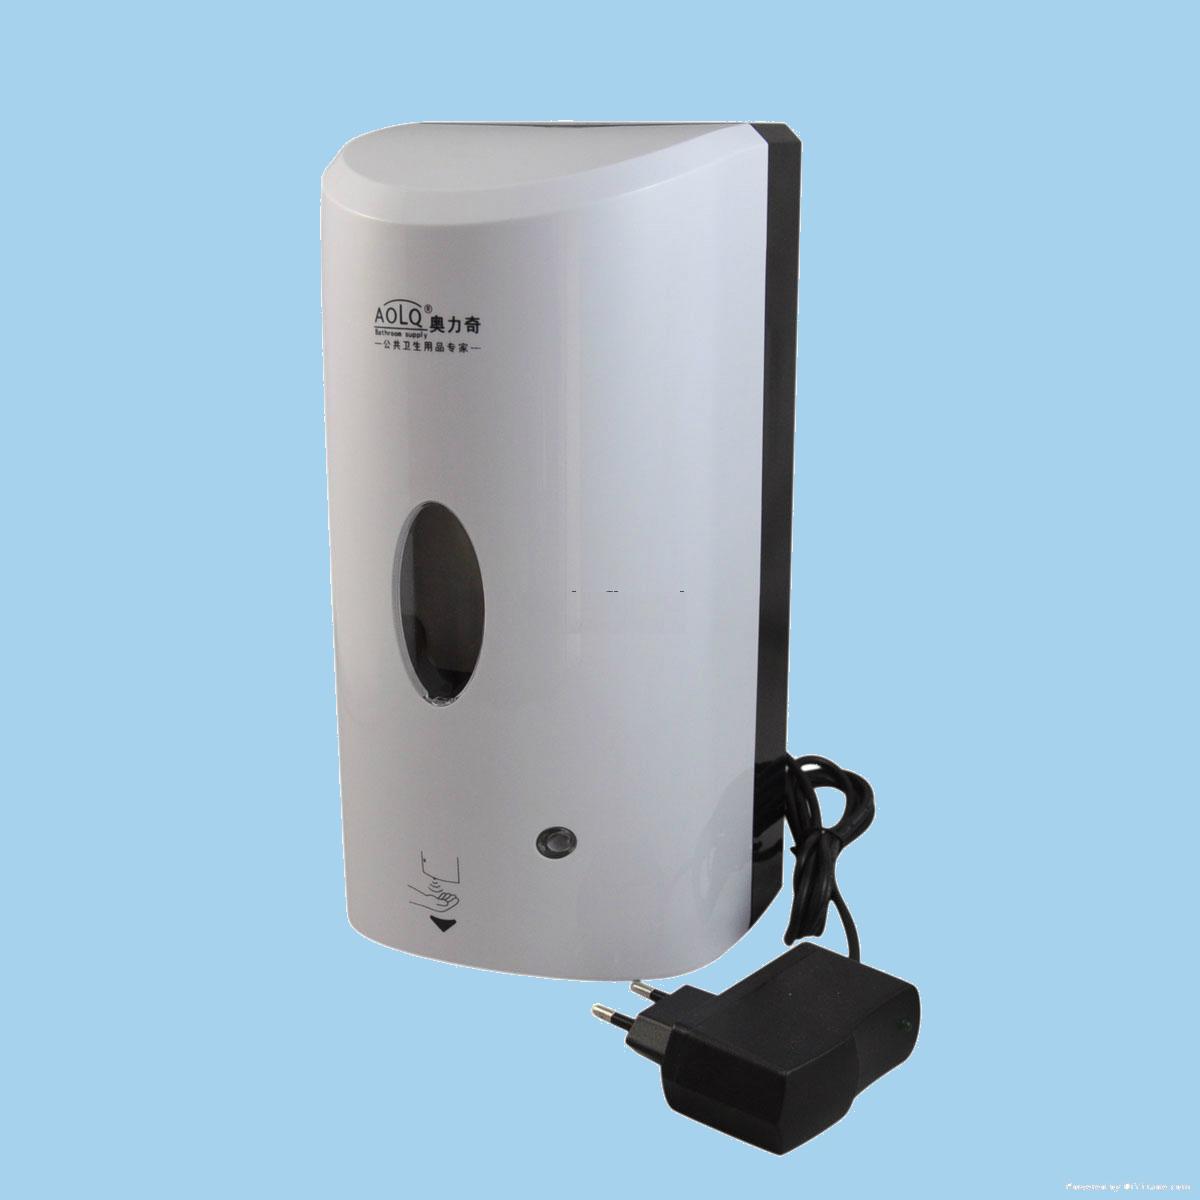 1.2 Litre Automatic Soap Dispenser Lagos Nigeria